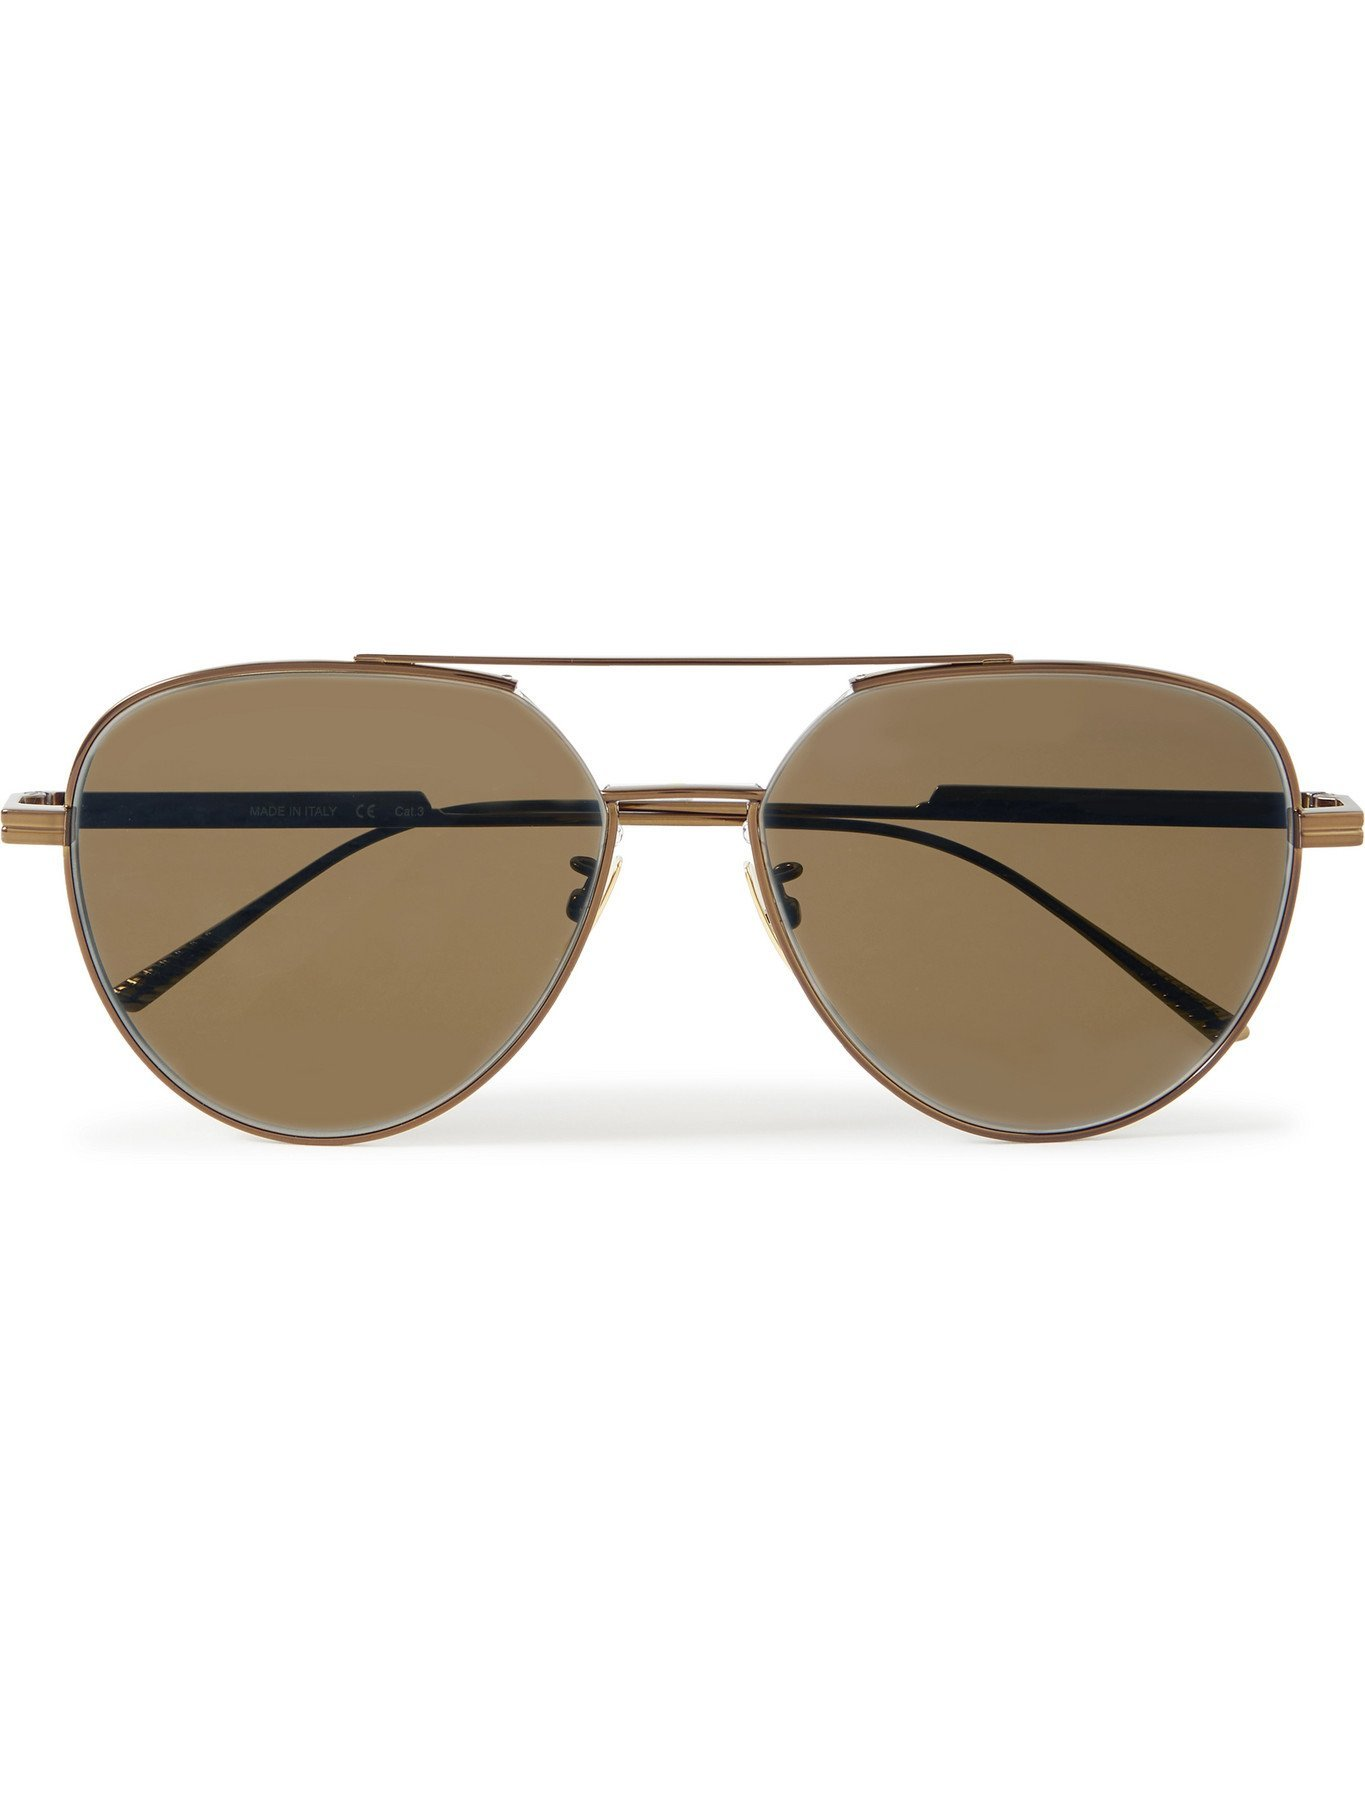 Photo: BOTTEGA VENETA - Aviator-Style Bronze-Tone Mirrored Sunglasses - Metallic